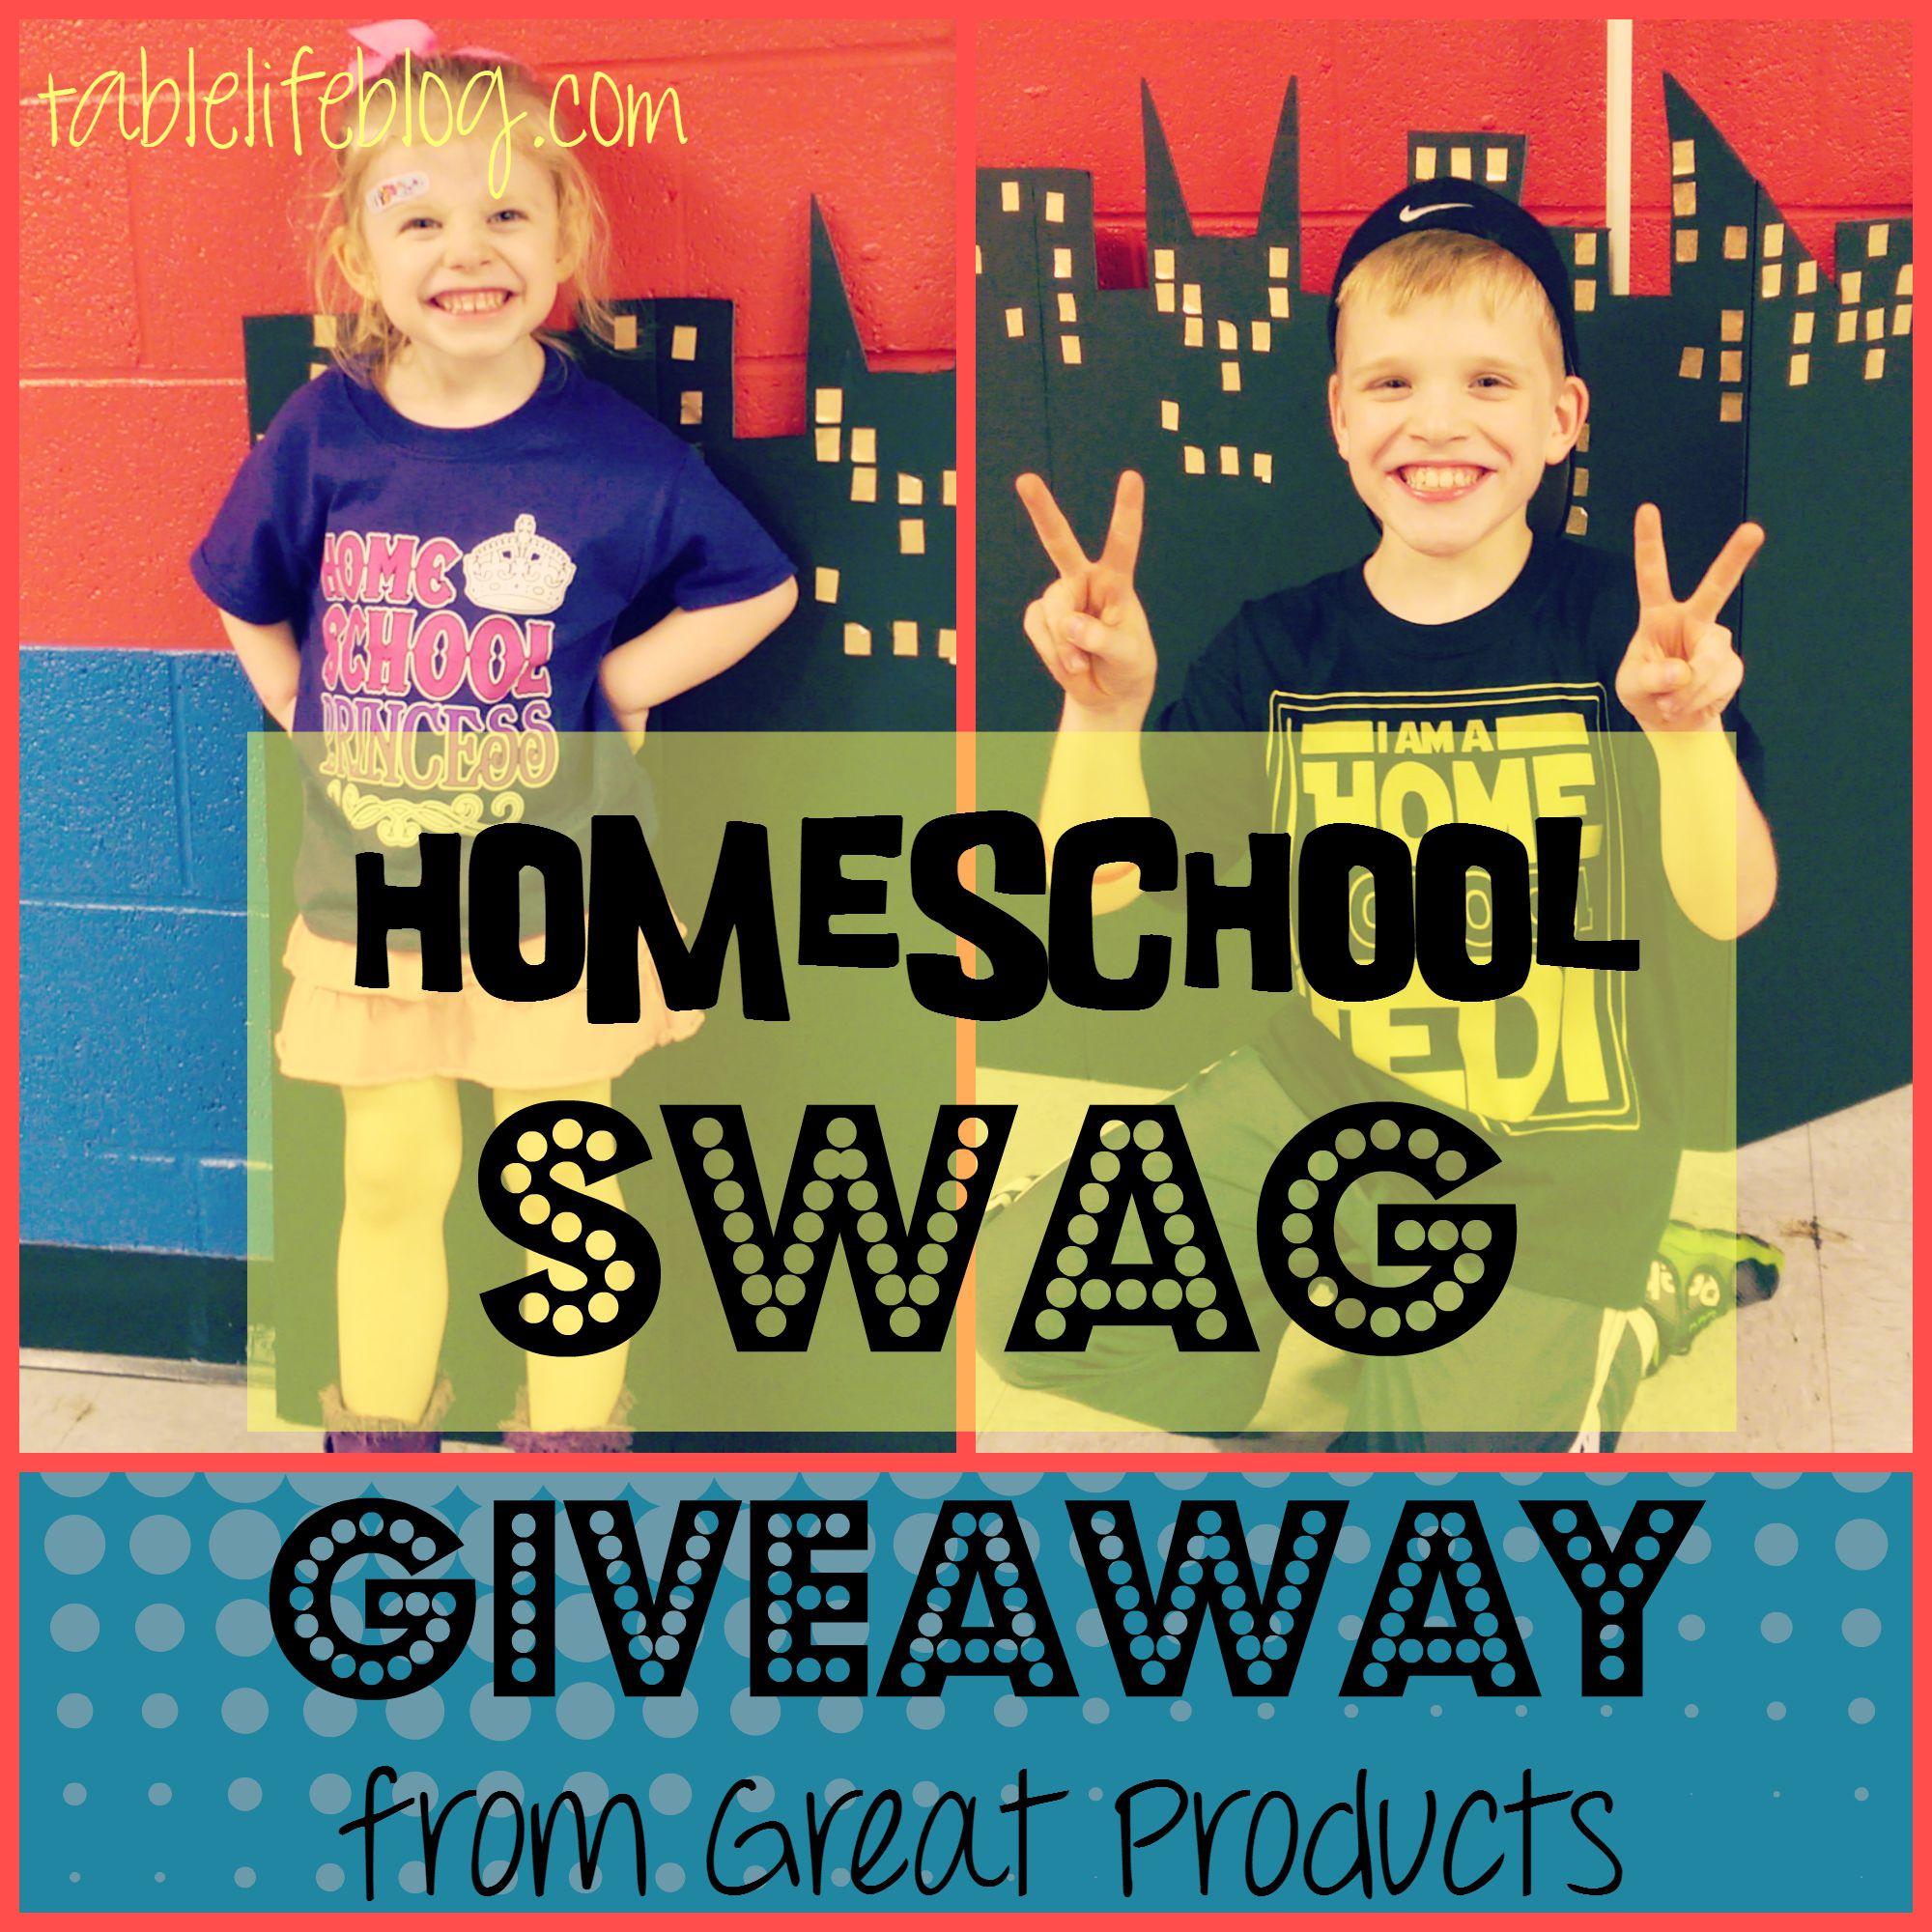 Homeschool T-Shirt Giveaway